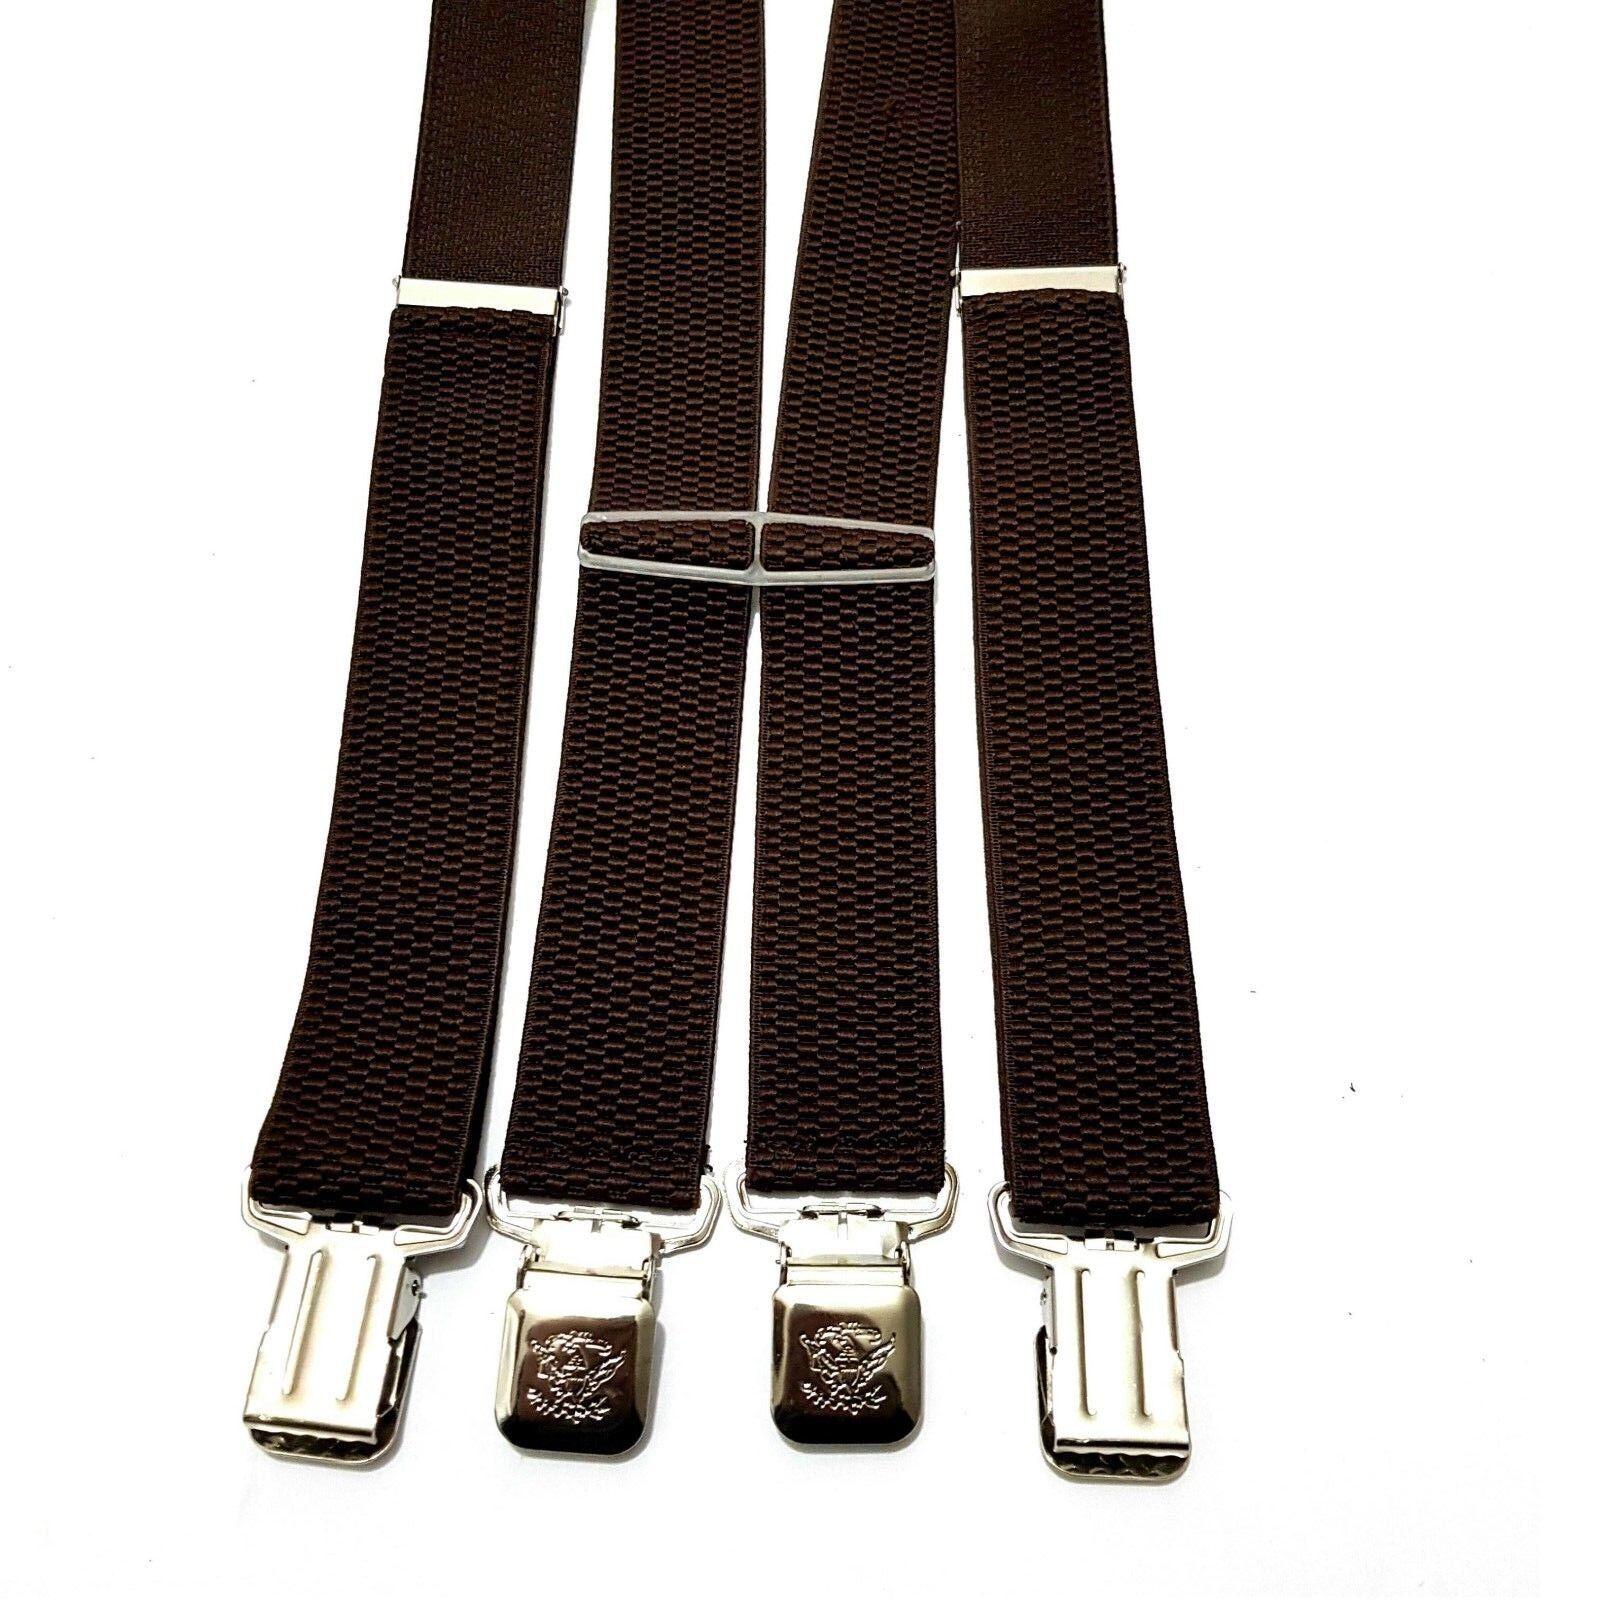 Damen Herren Hosenträger Hose Gürtel Braun 4 starke Clips Träger H-Form breit